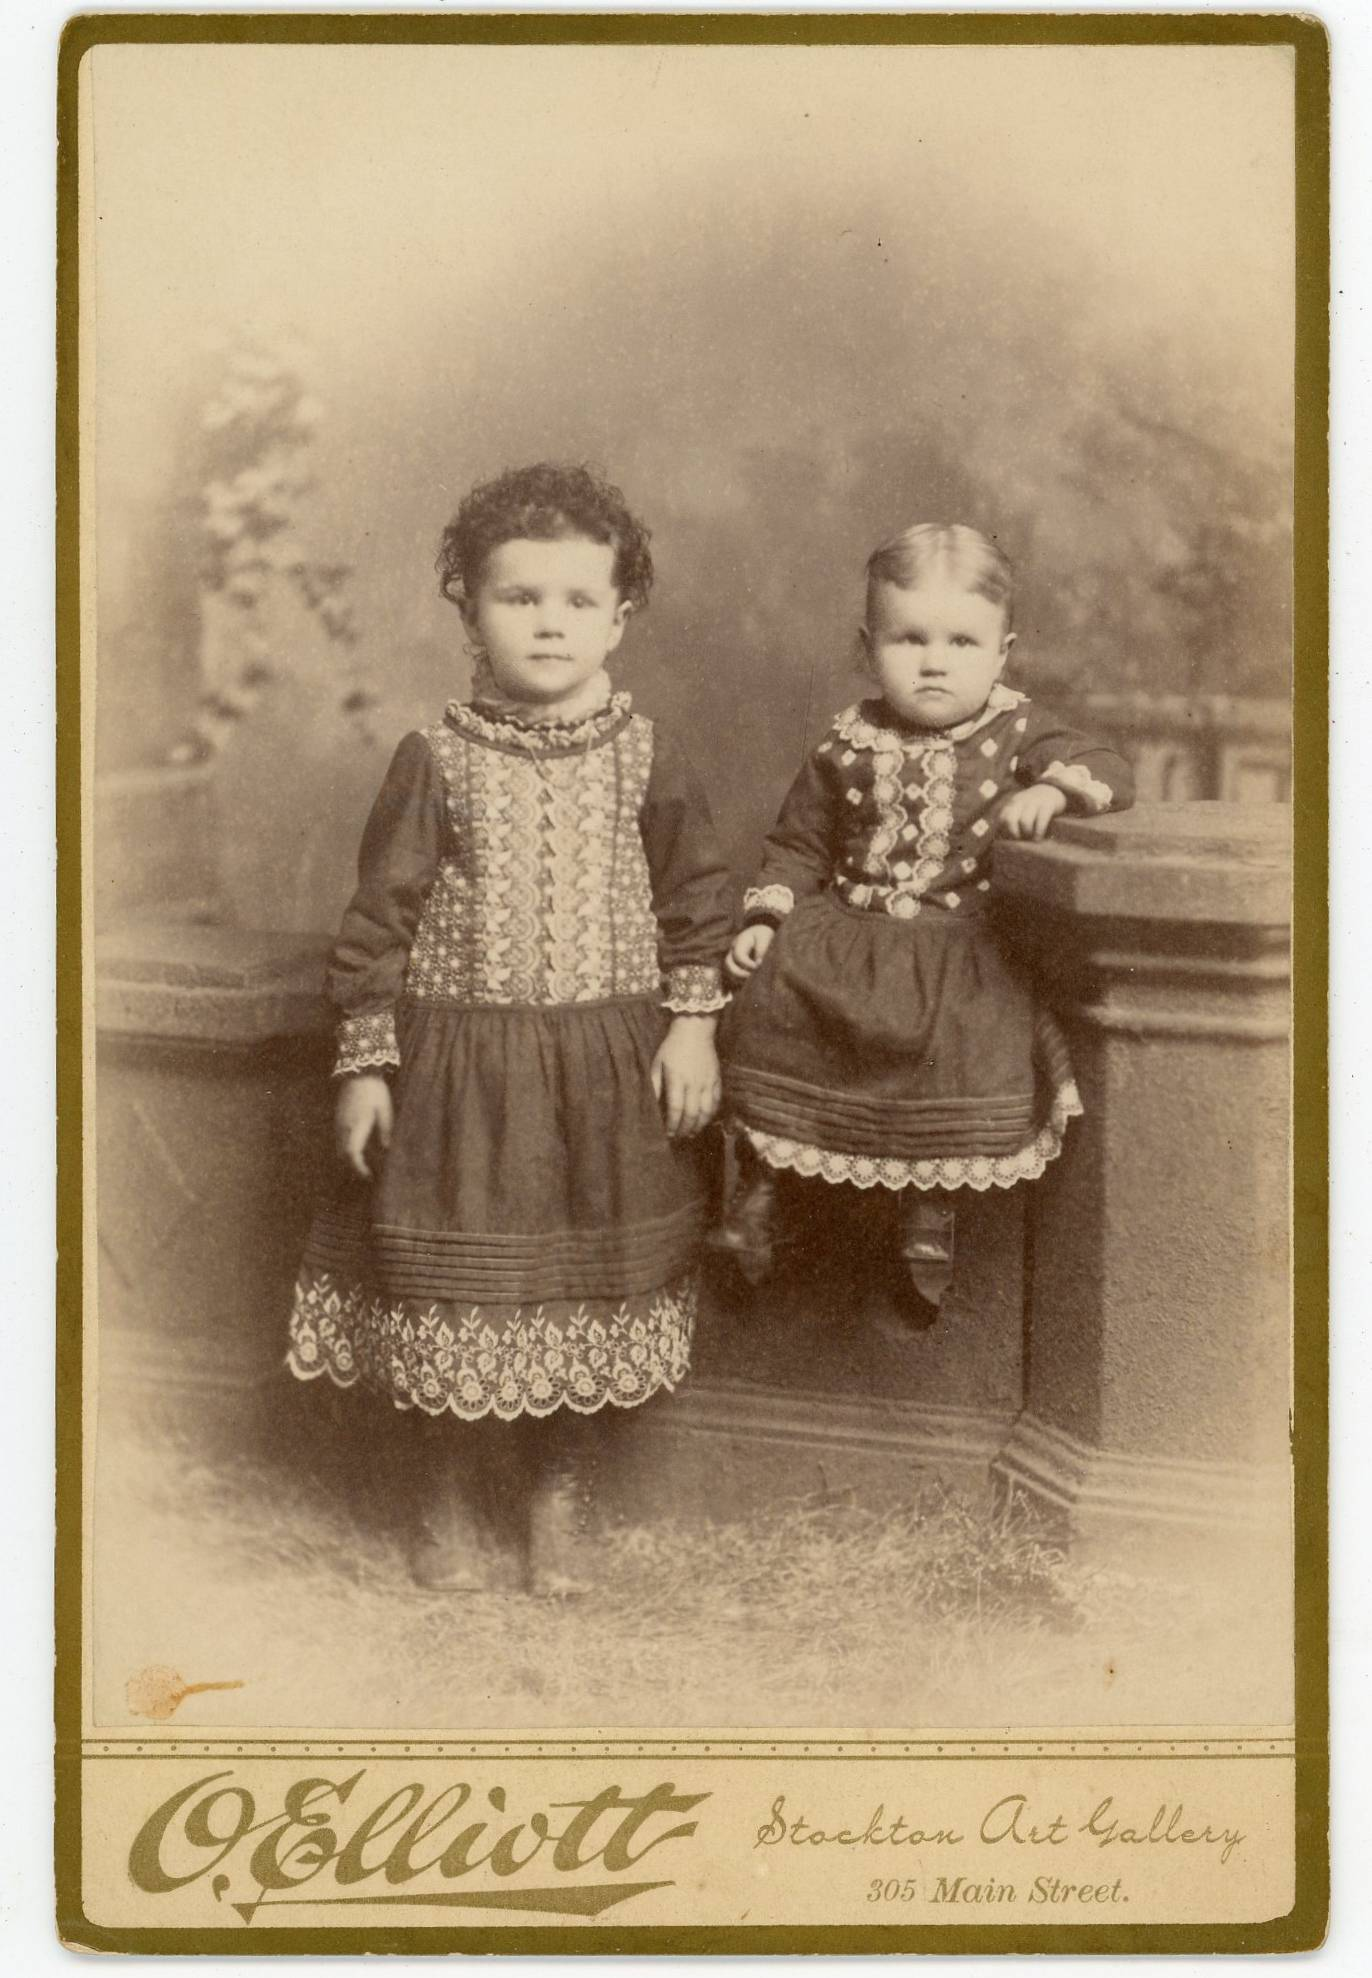 O. Elliott, photographer, of Stockton, California